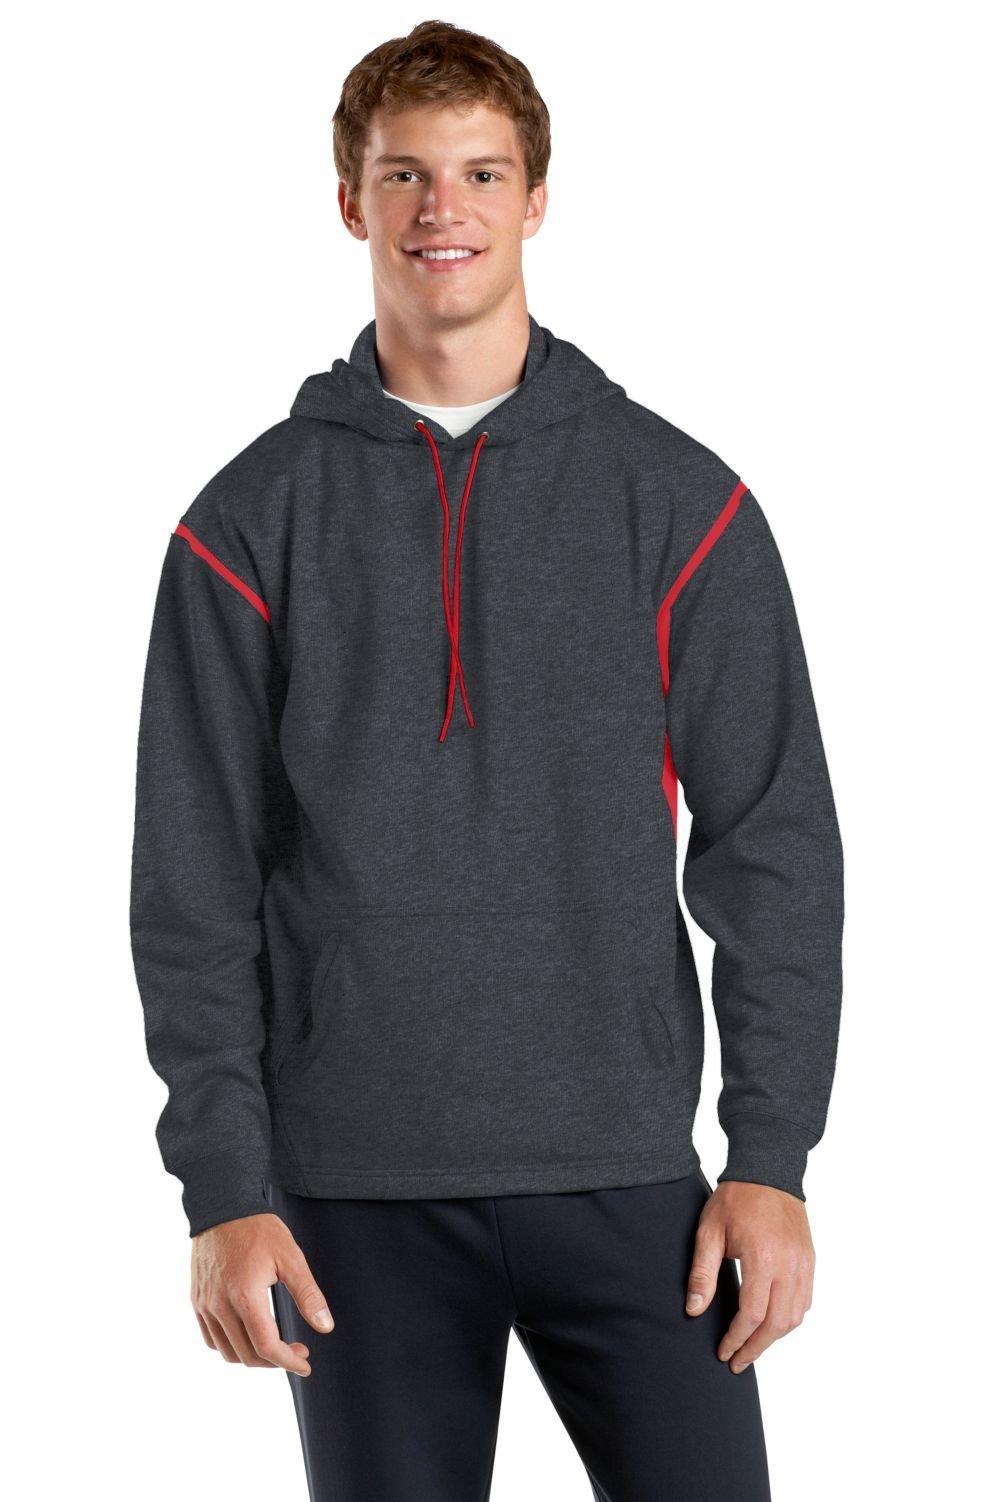 Sport-Tek Men's Tall Tech Fleece Colorblock 2XLT Graphite Heather/True Red by Sport-Tek